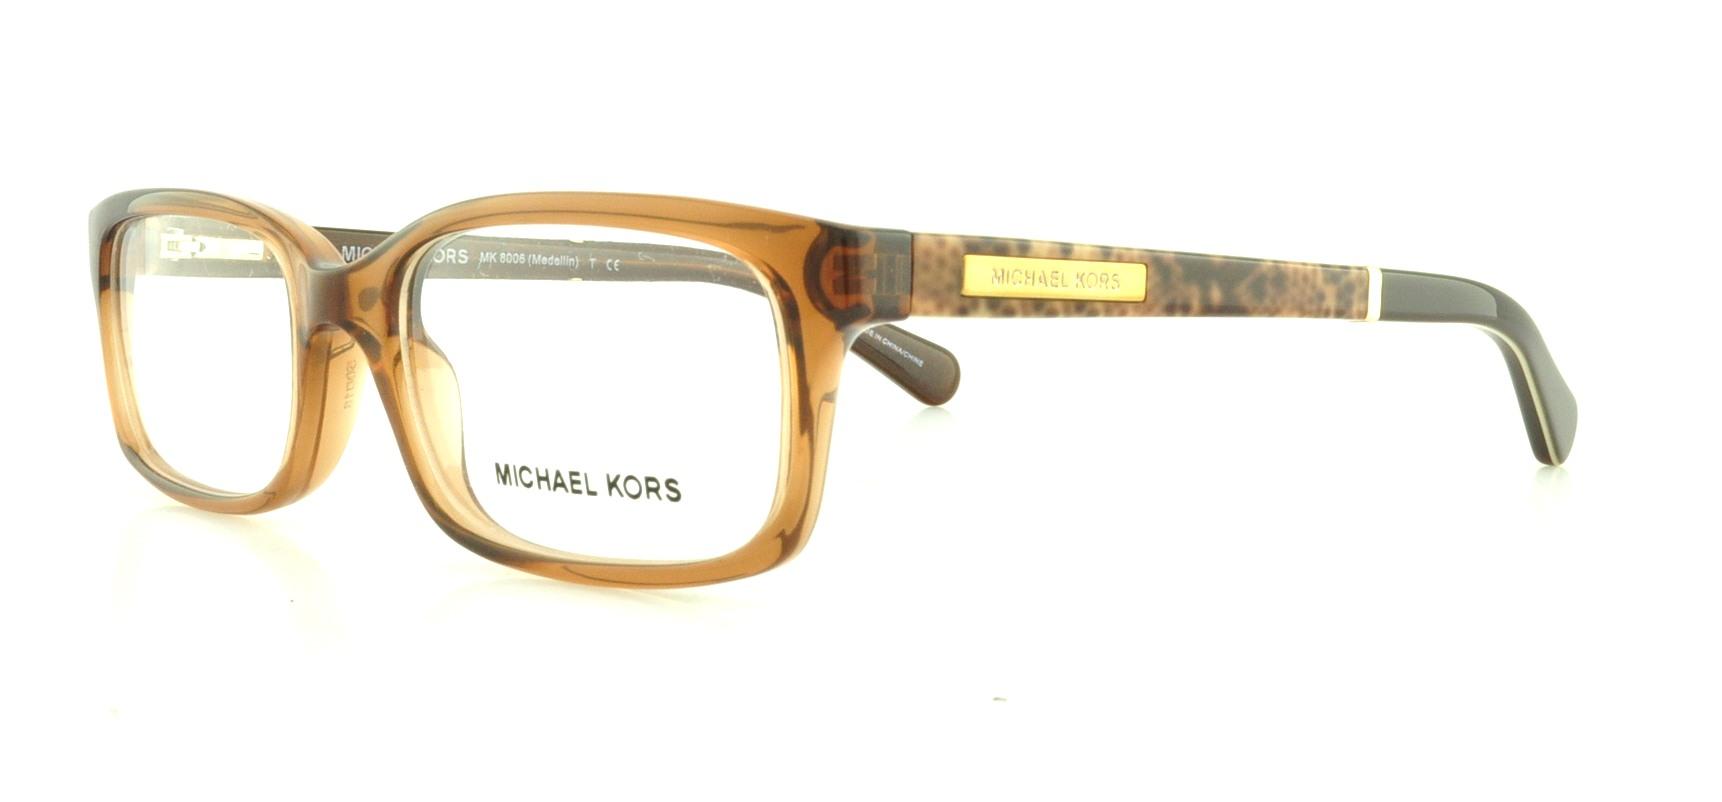 80d8b4019697 Michael Kors Eyeglasses Outlet